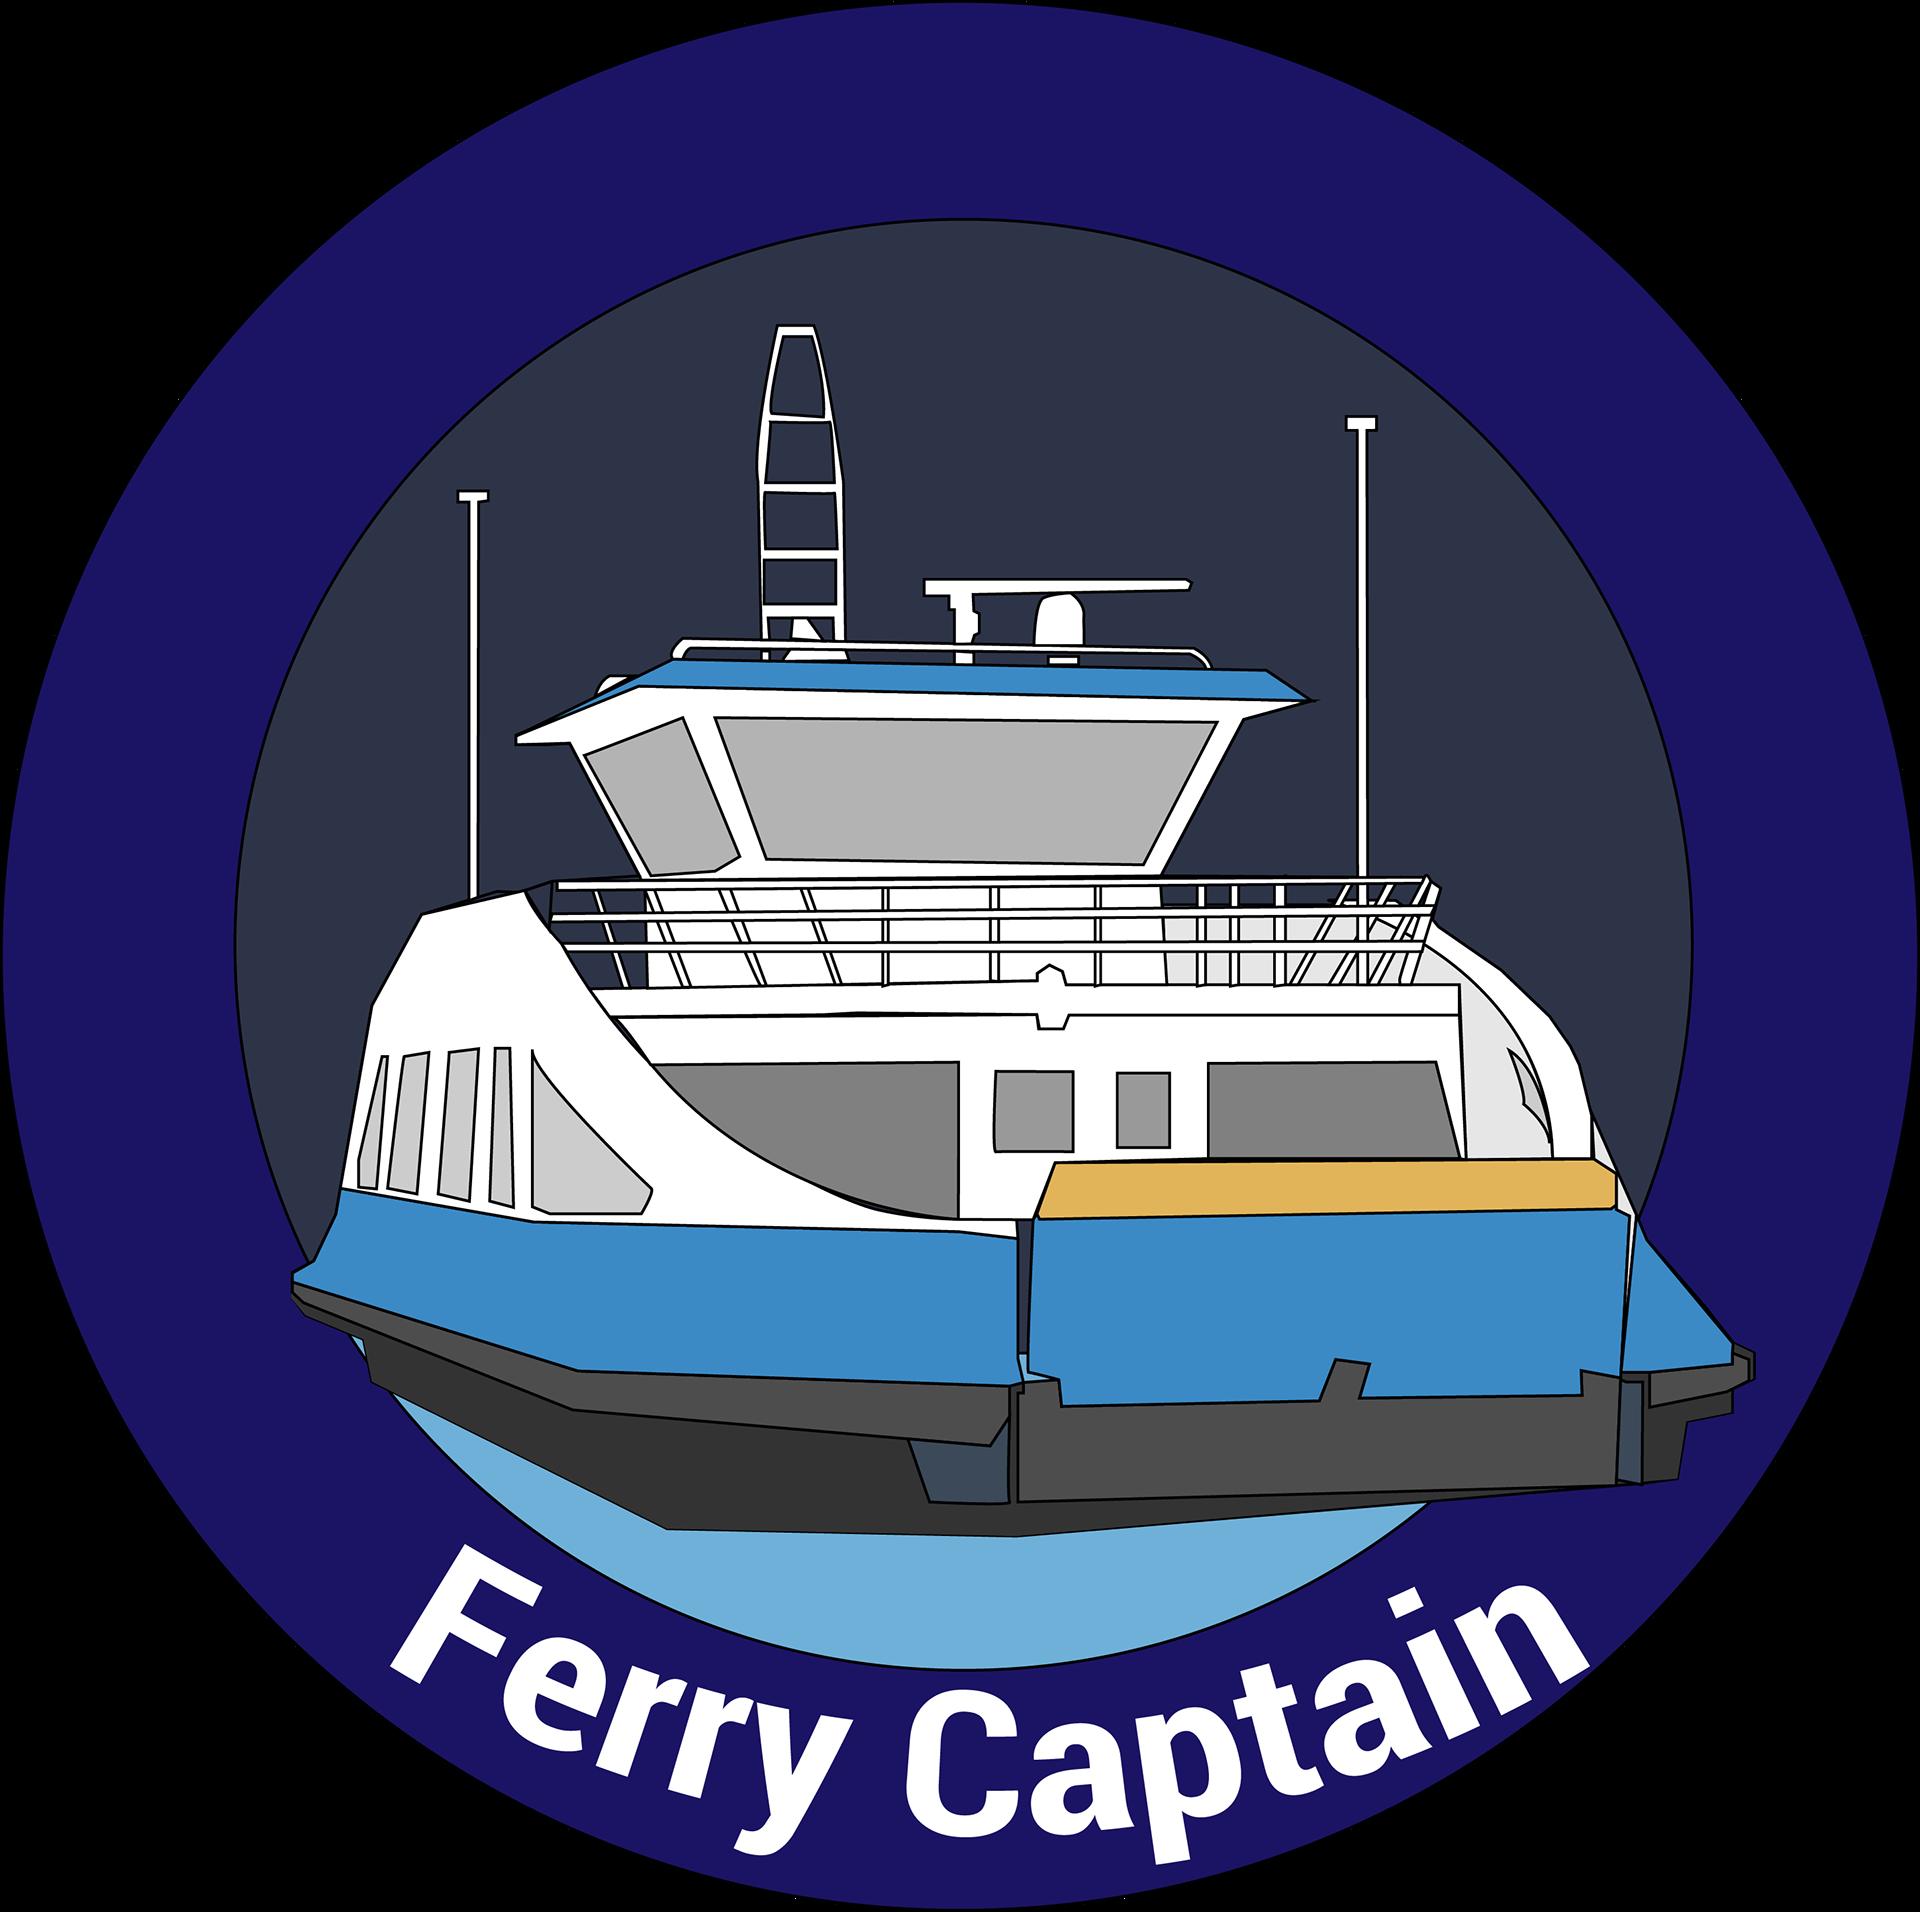 Tiago dos santos pedrosa. Transportation clipart ferries